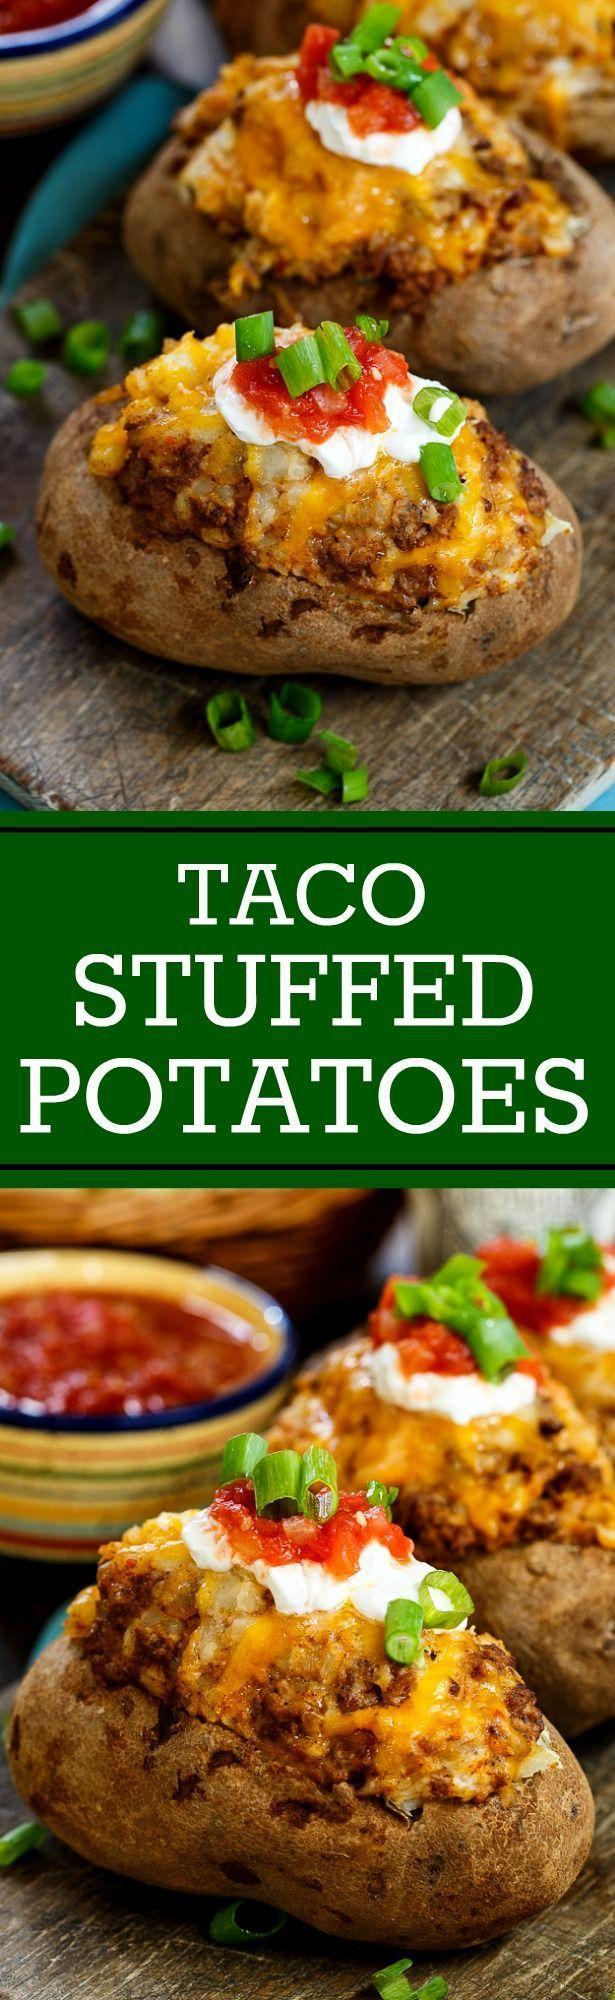 Double Stuffed Taco Potatoes